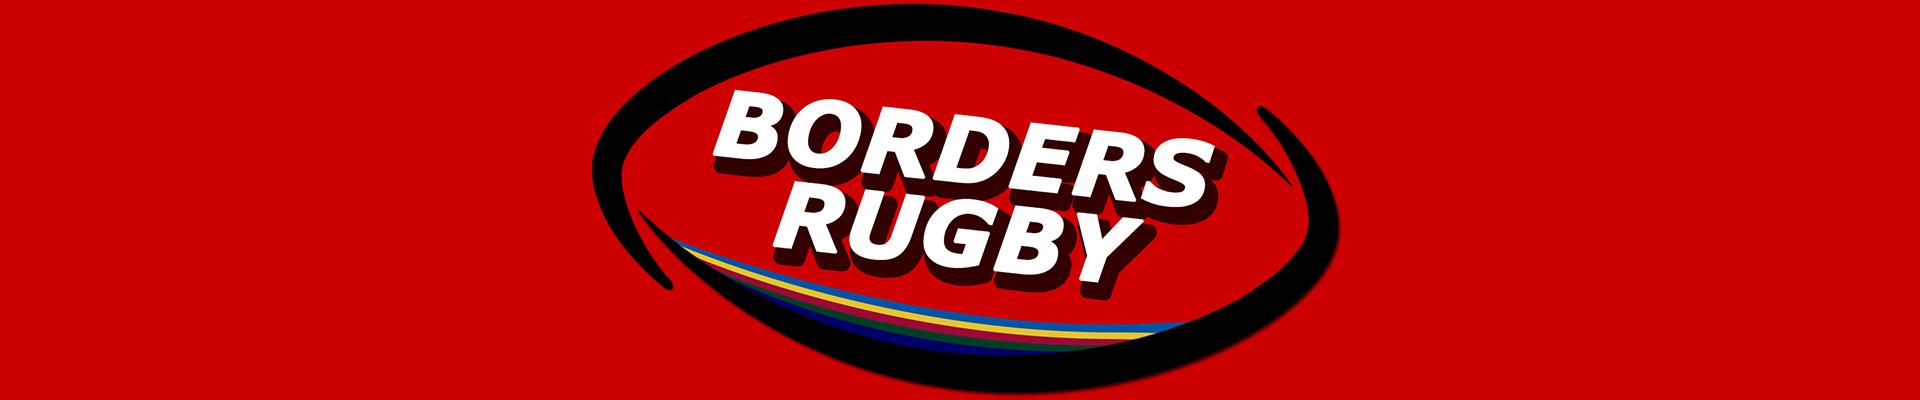 bordersrugby.net